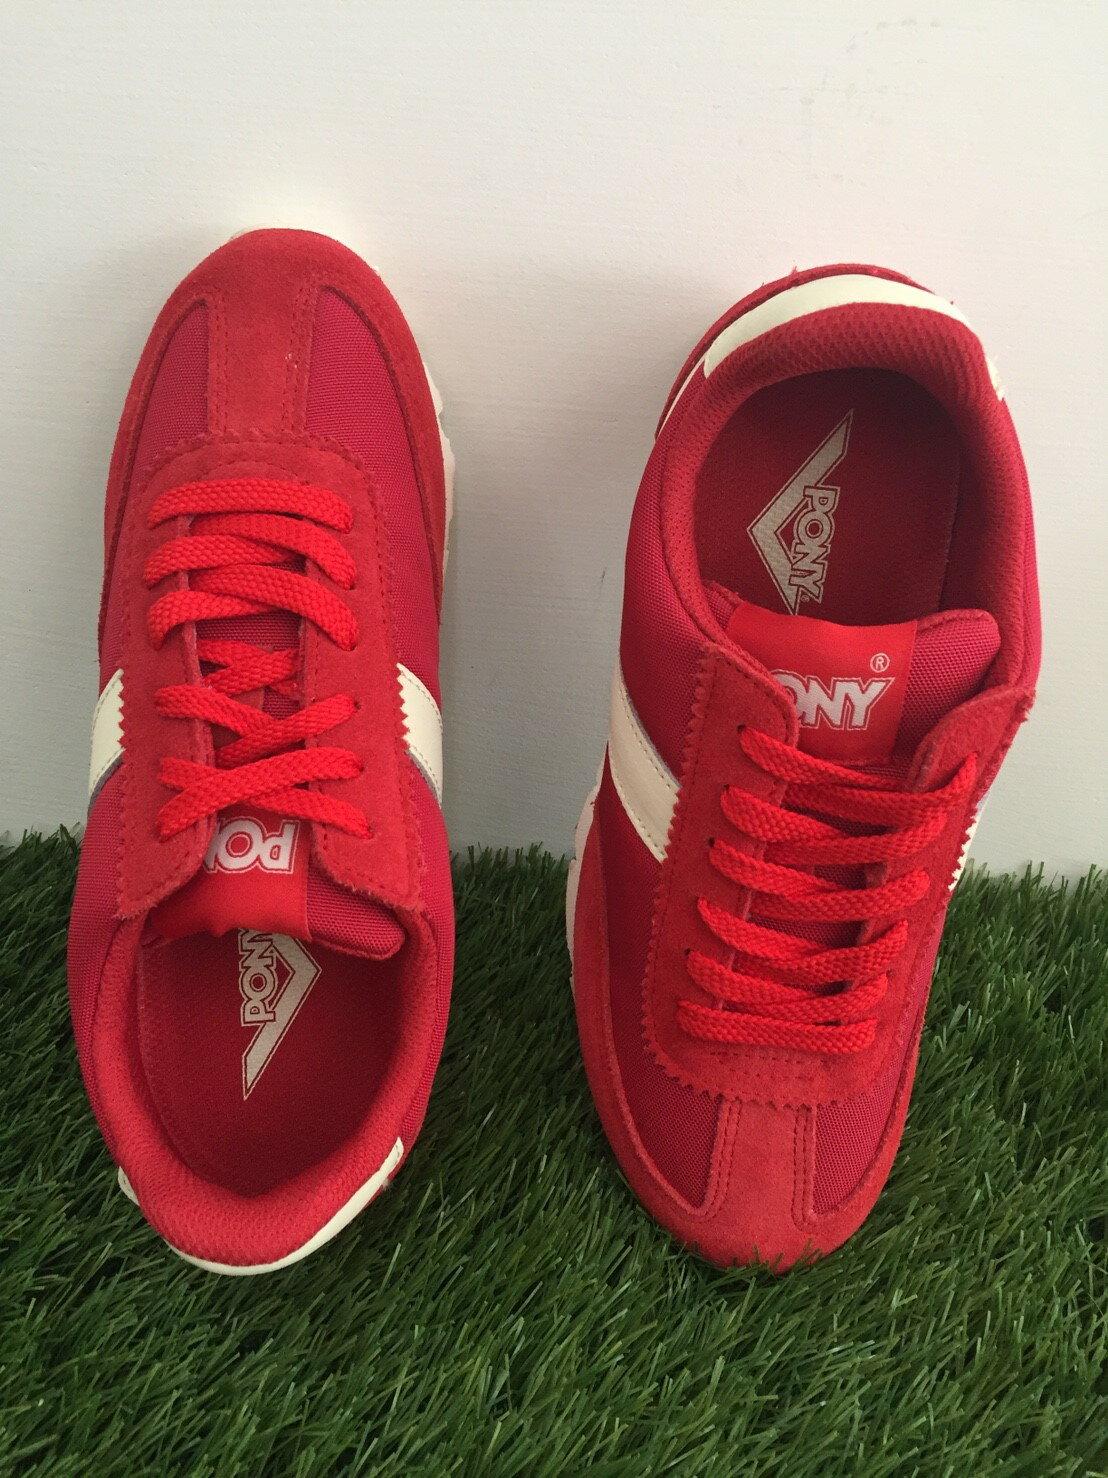 [25cm]★限時特價990元★ Shoestw【53W1SO79RD】PONY 復古慢跑鞋 內增高 紅白色 女生 1